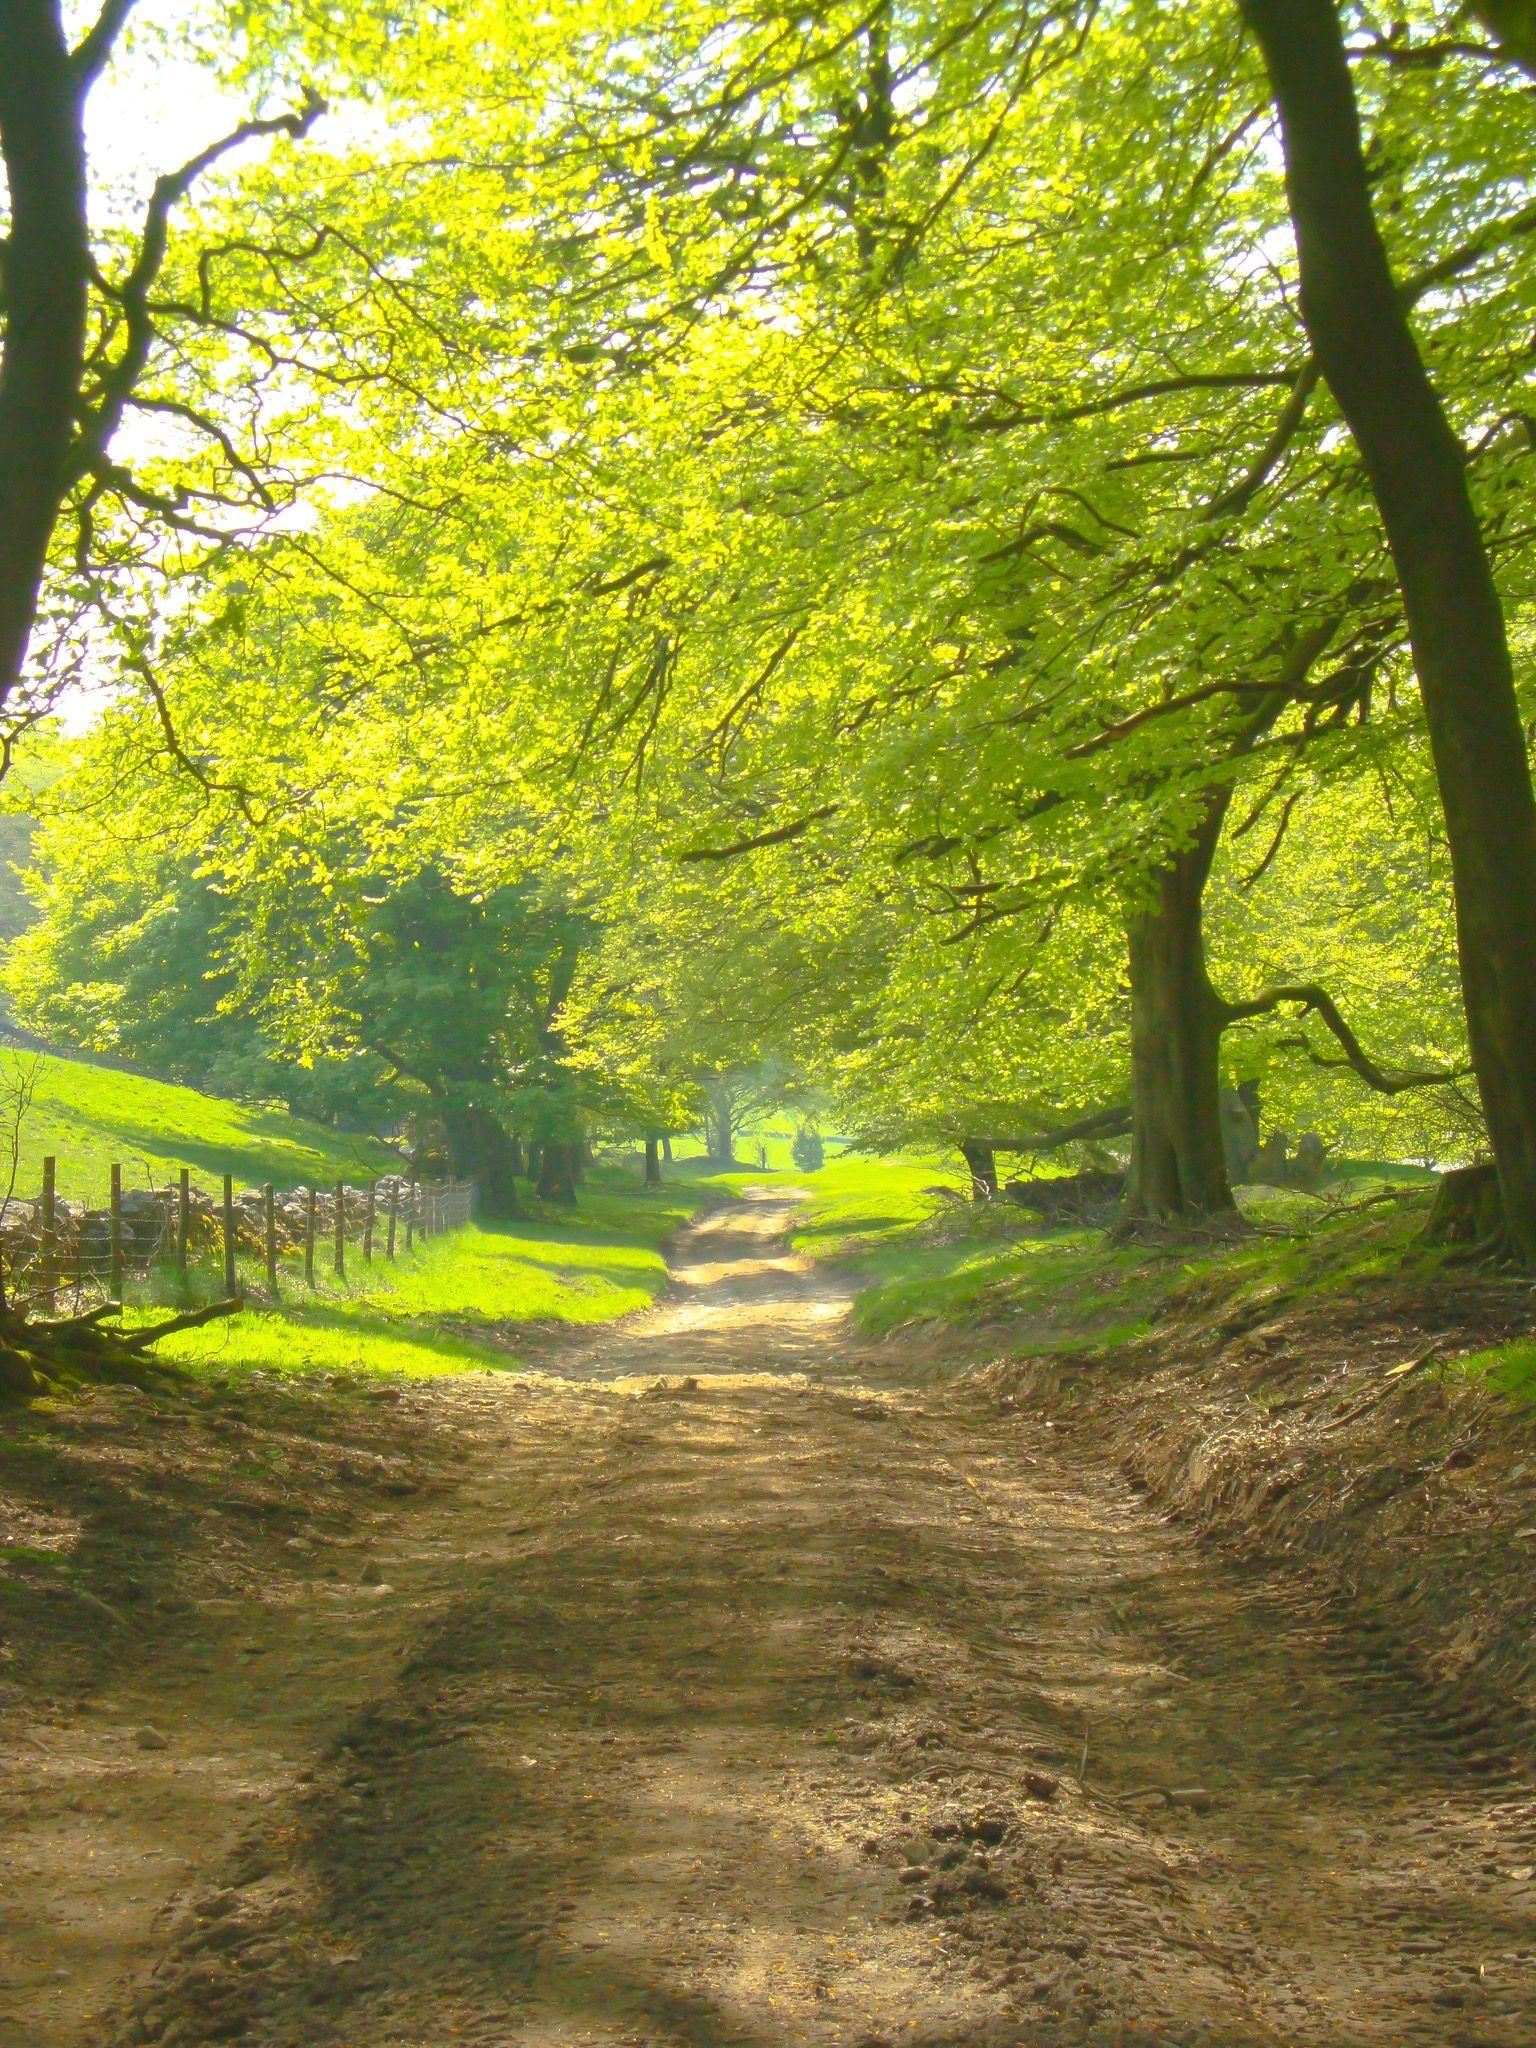 Country lane (Castleton, Derbyshire, England) by Alex Donahue